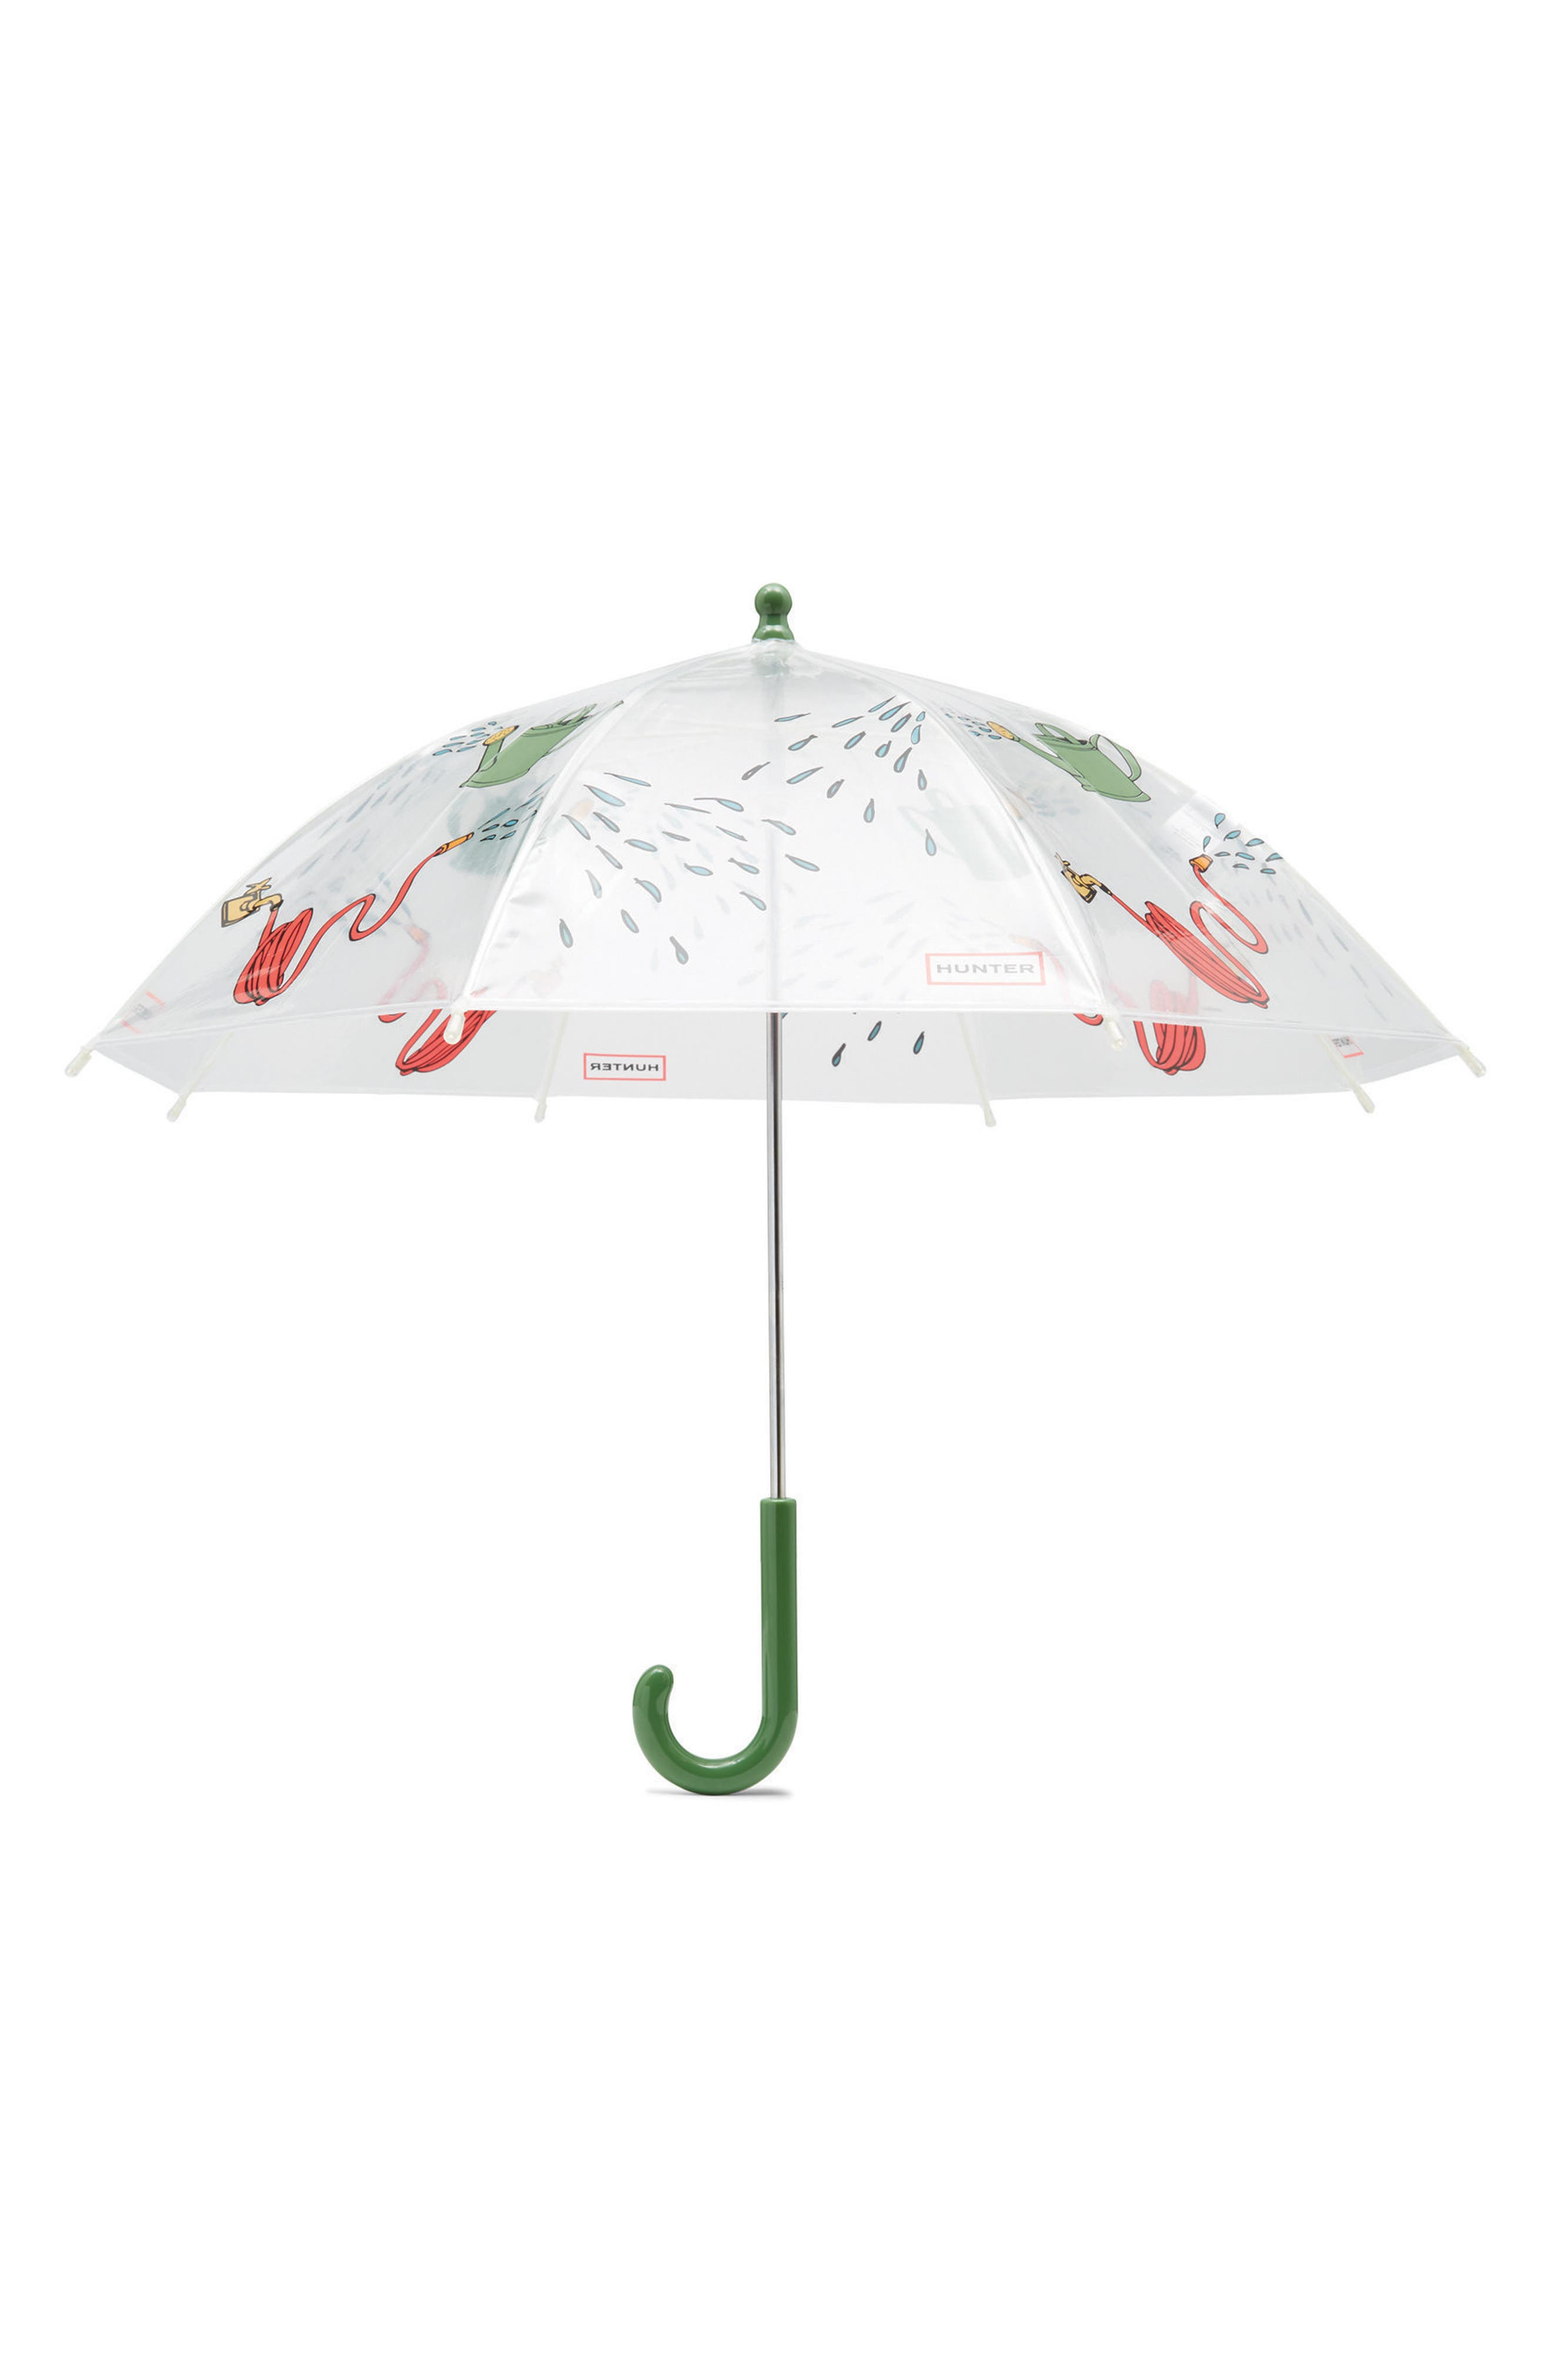 Watering Can Umbrella,                             Main thumbnail 1, color,                             Gardening Print